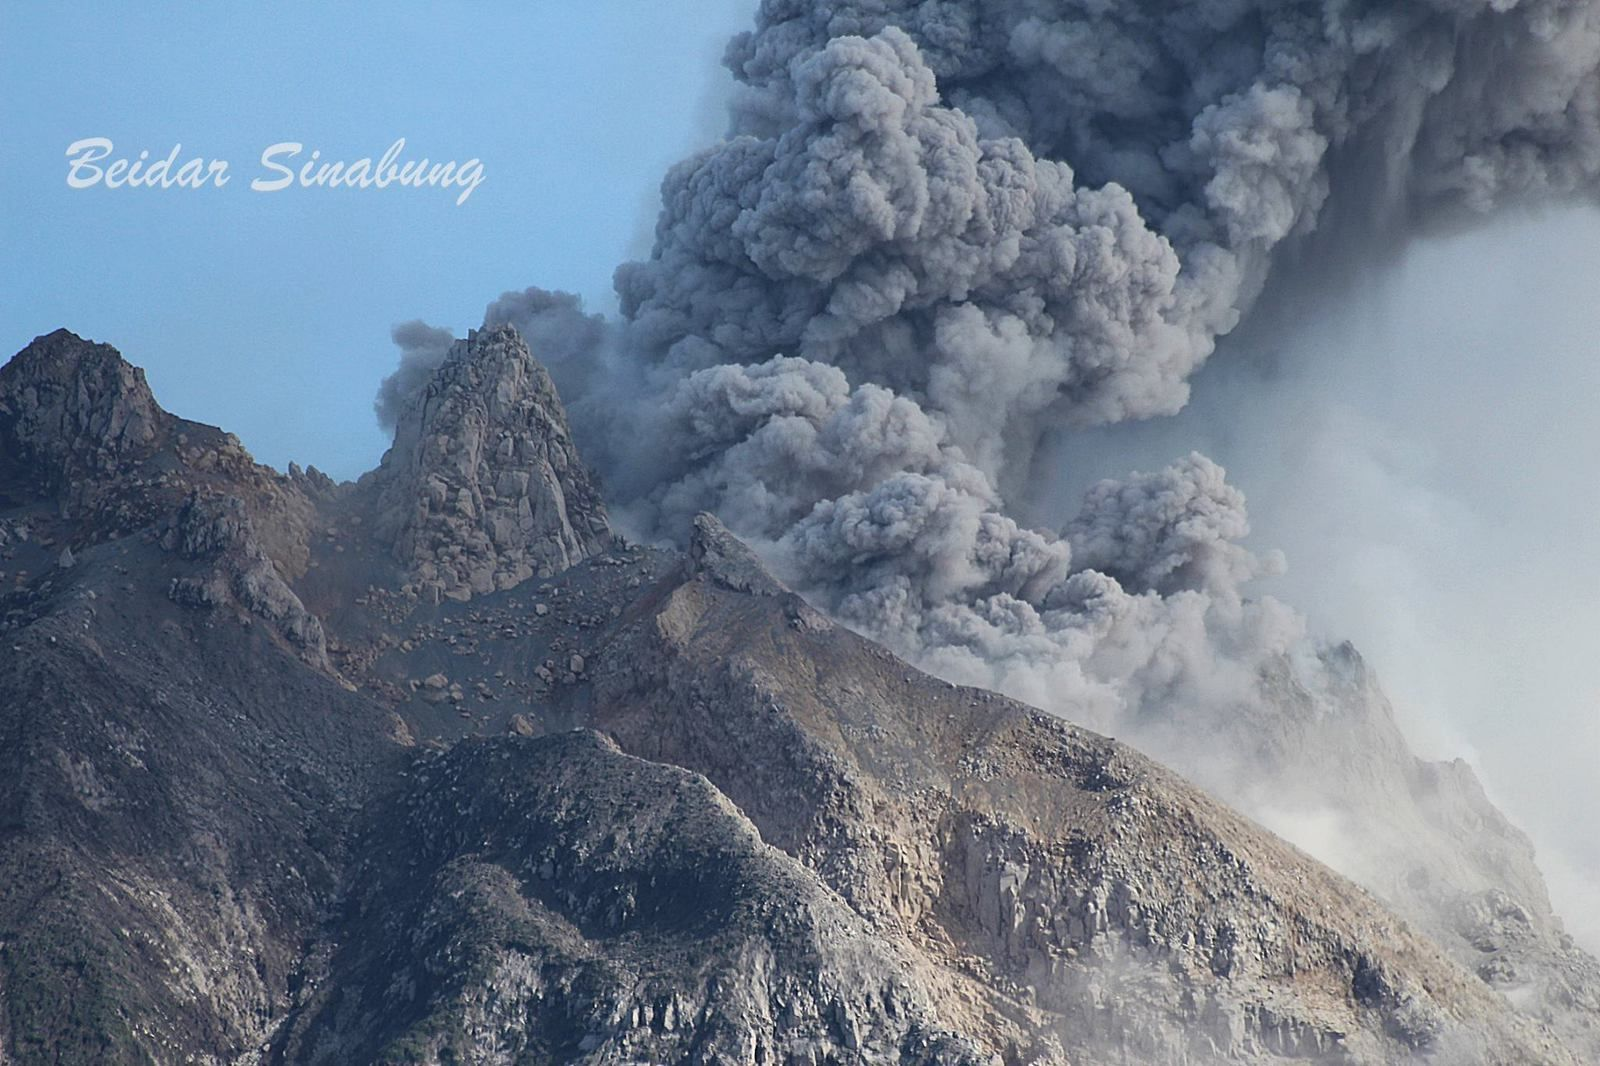 Sinabung - 05.02.2019 / 9h35 WIB - photo F.Surbakti, via Beidar Sinabung